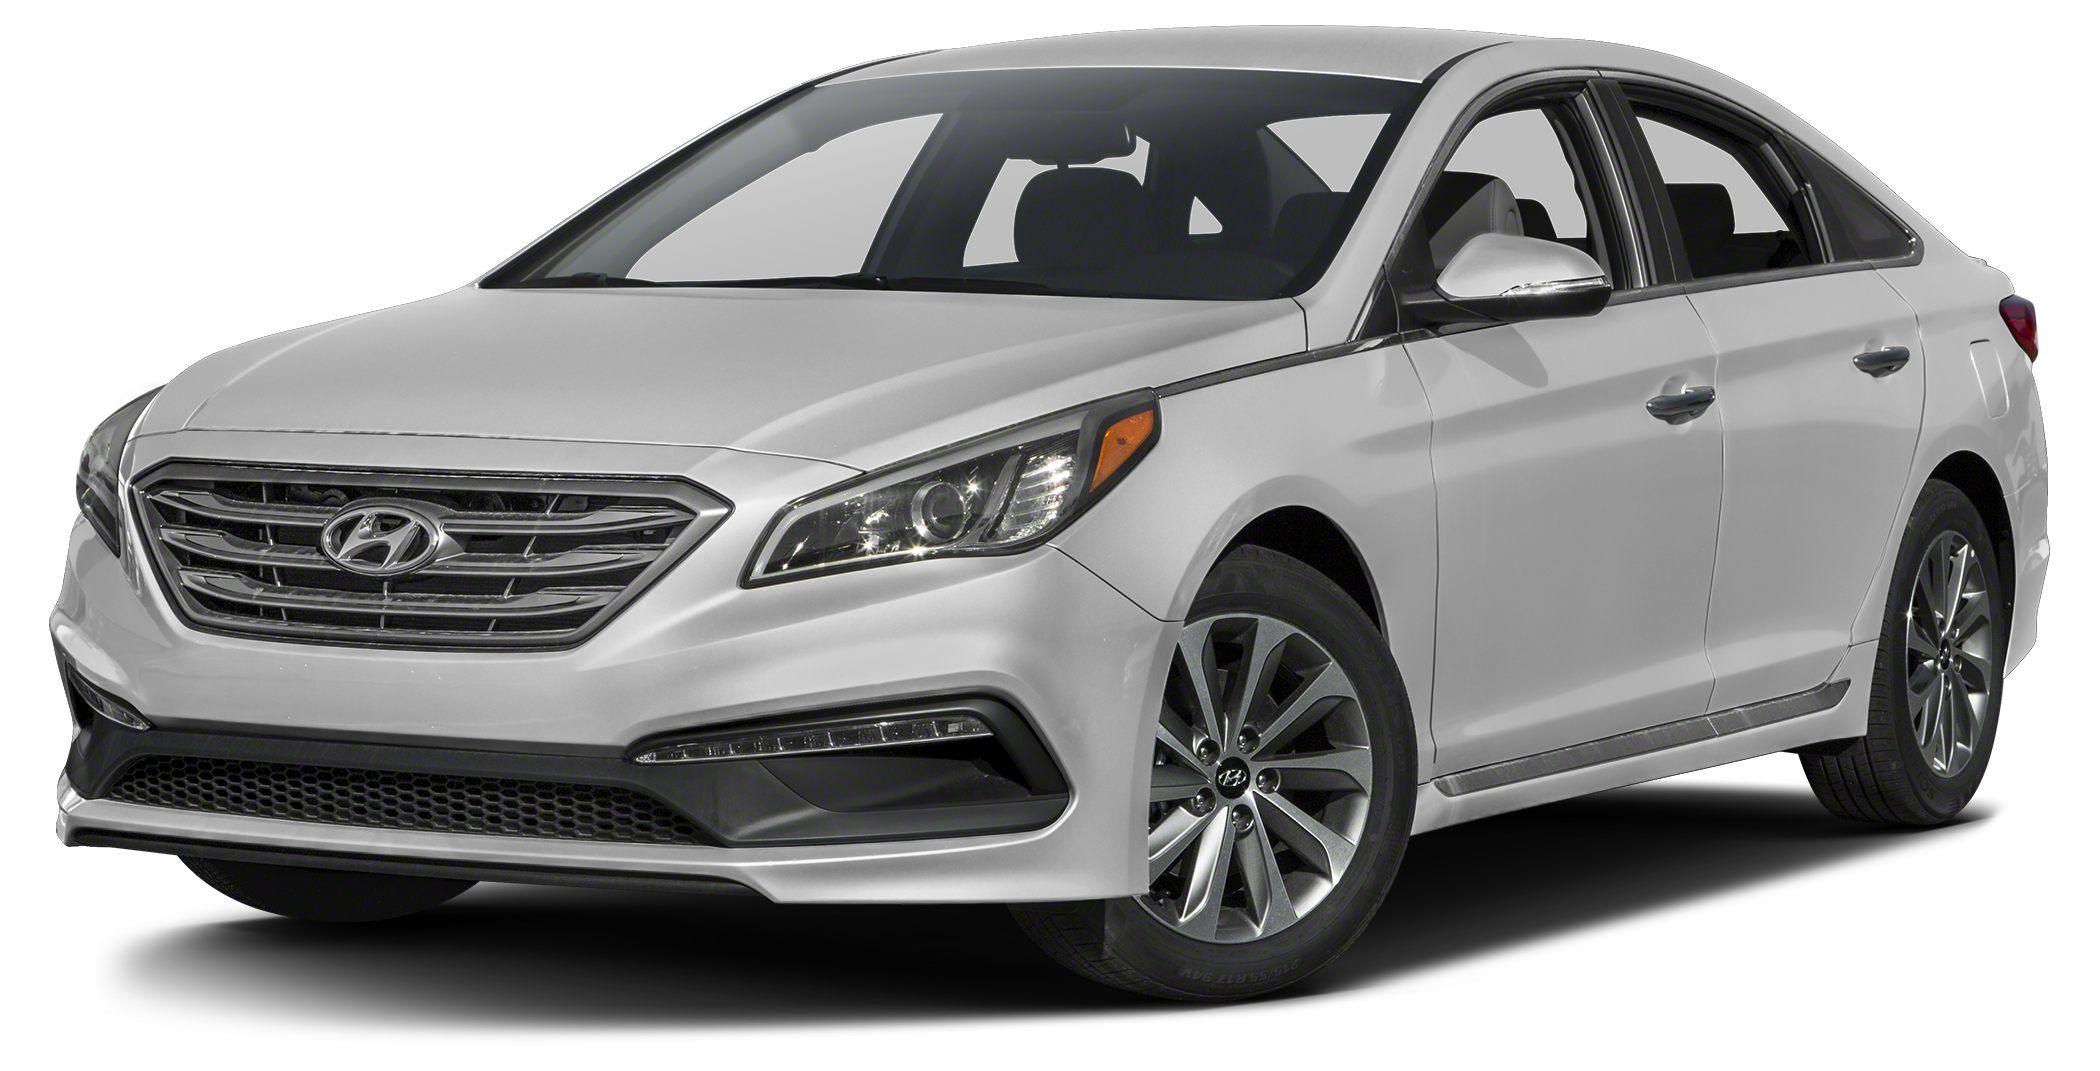 2016 Hyundai Sonata Sport Price includes 500 - Military Program Exp 01022017 1000 - Uber